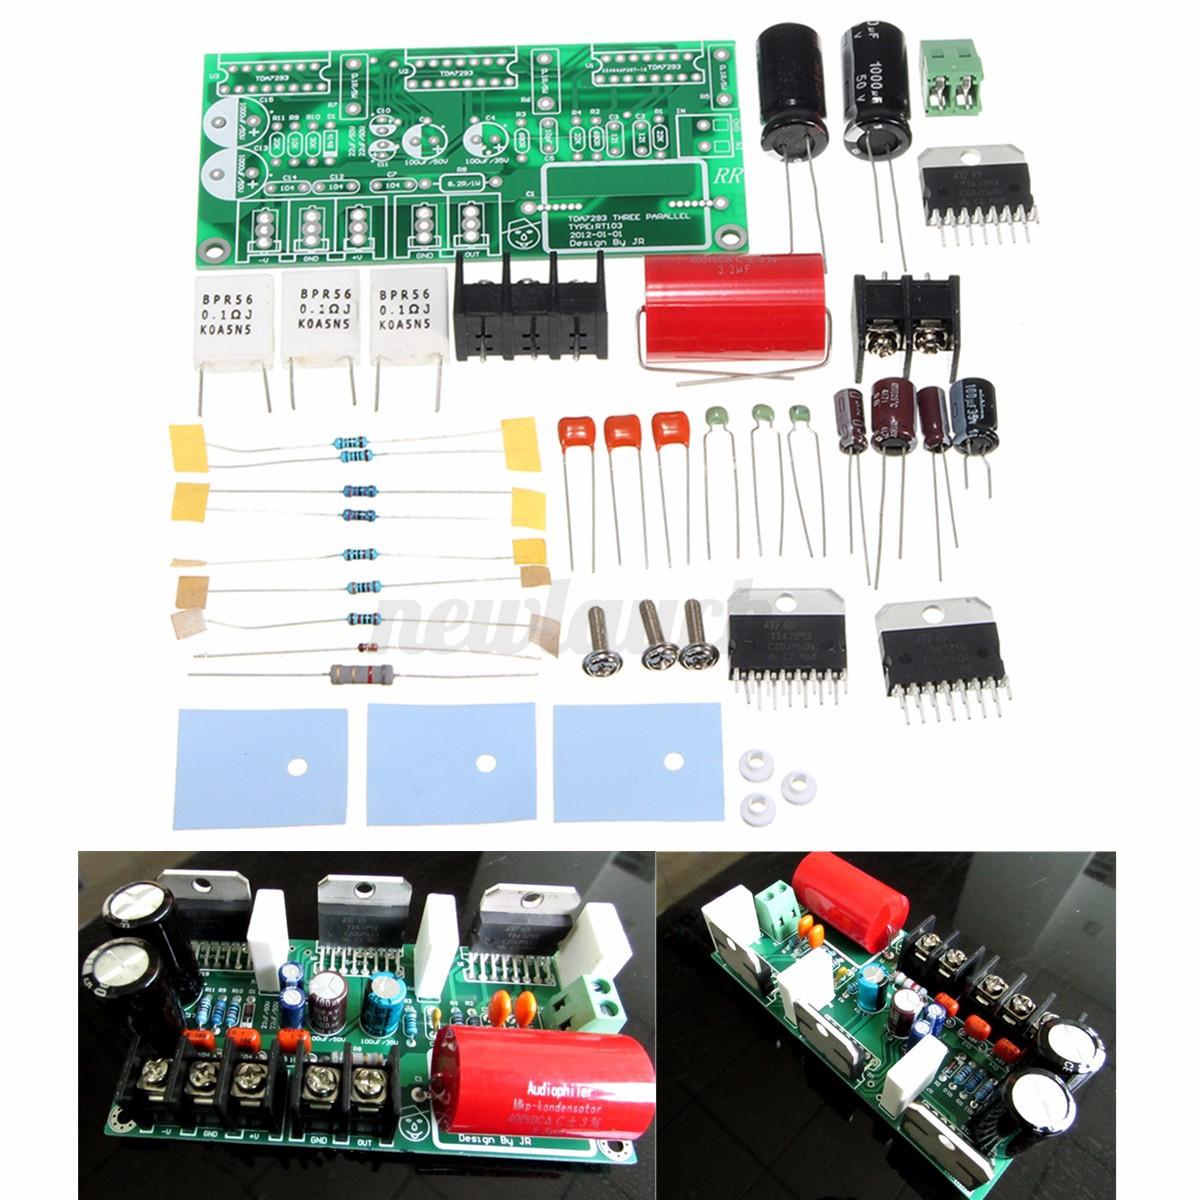 tda7293 three parallel 250w mono power audio amplifier board btl amp diy kits ebay. Black Bedroom Furniture Sets. Home Design Ideas